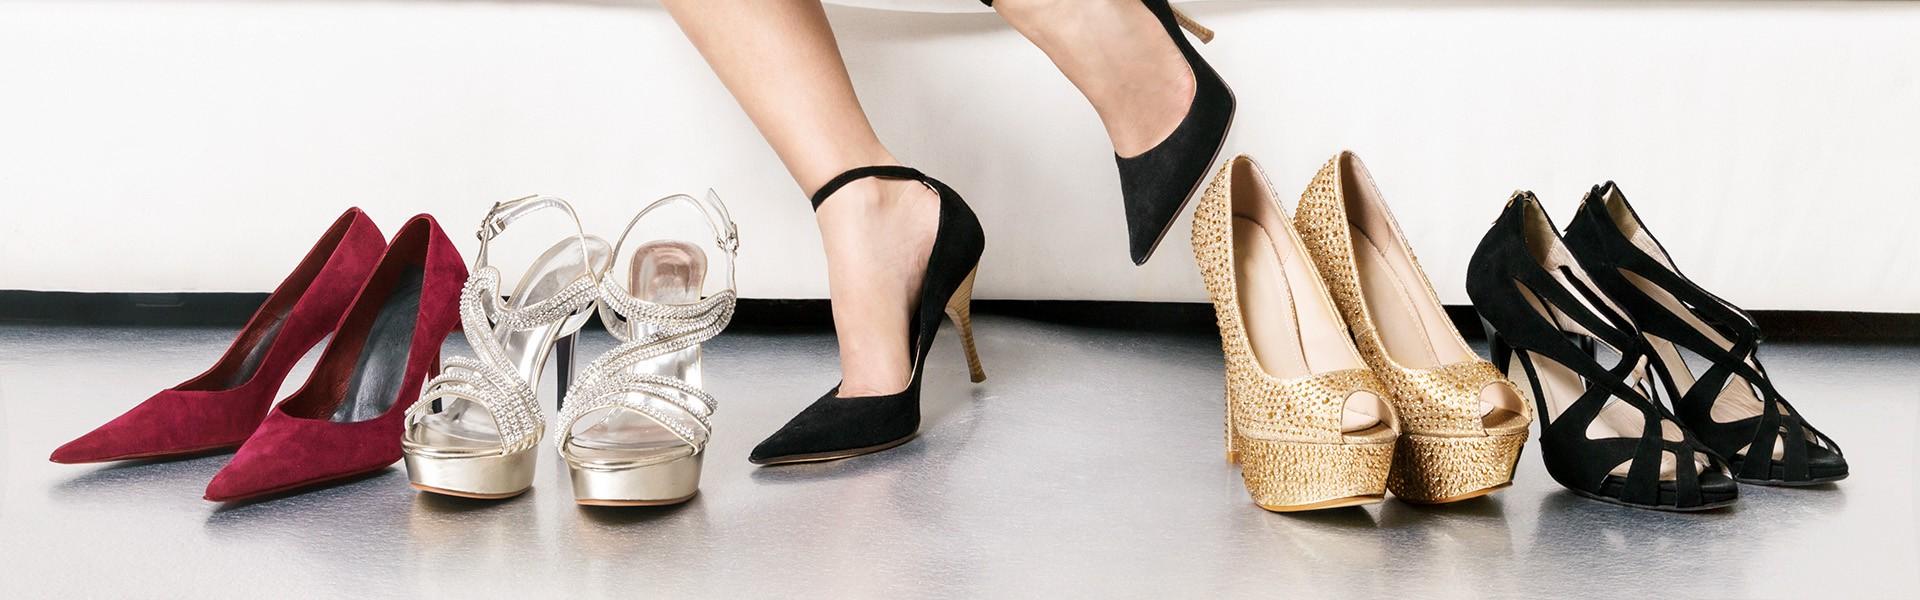 shoes_donna